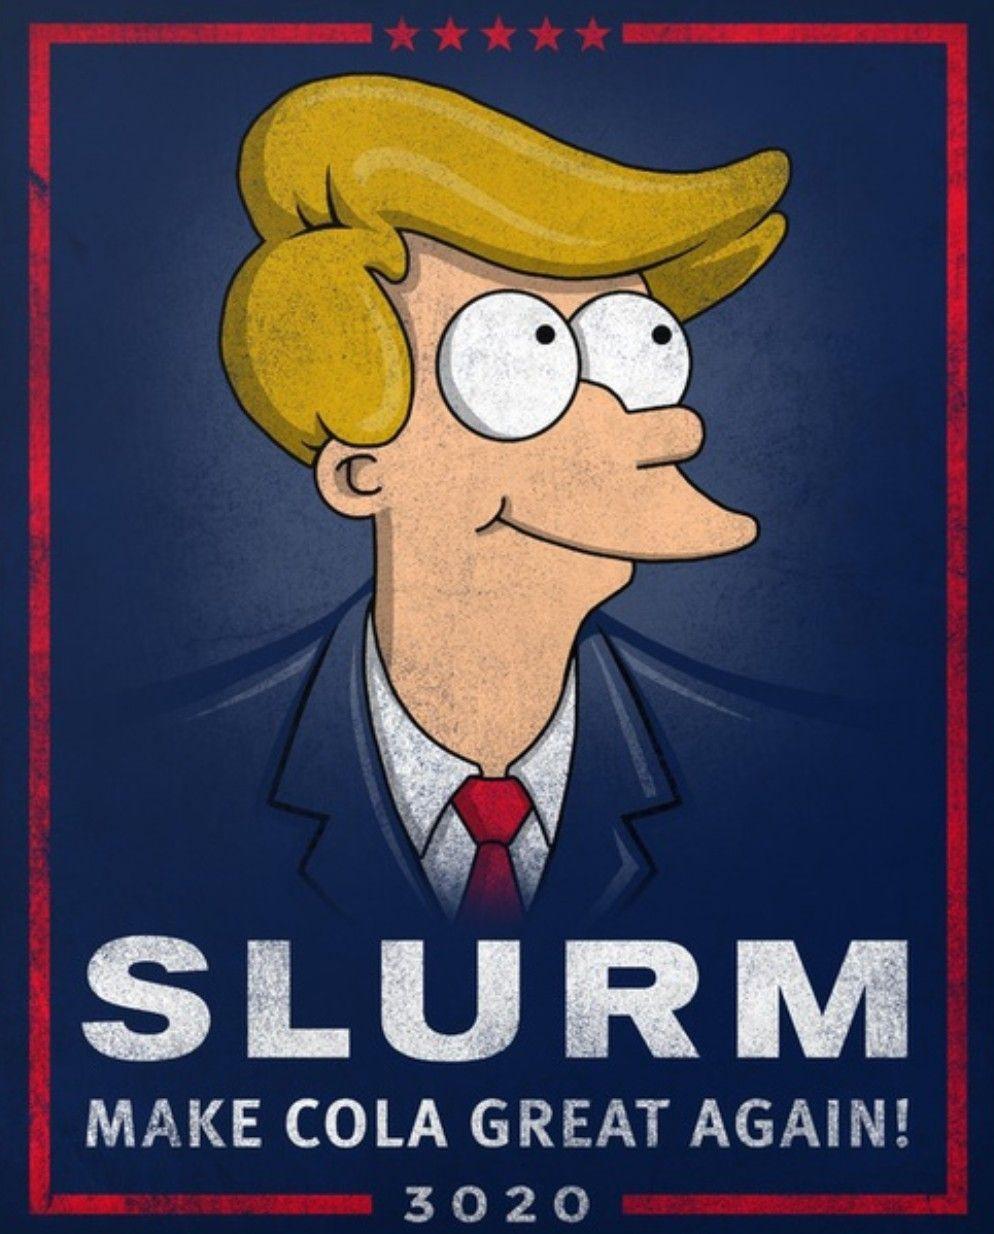 Slurm has my vote - meme